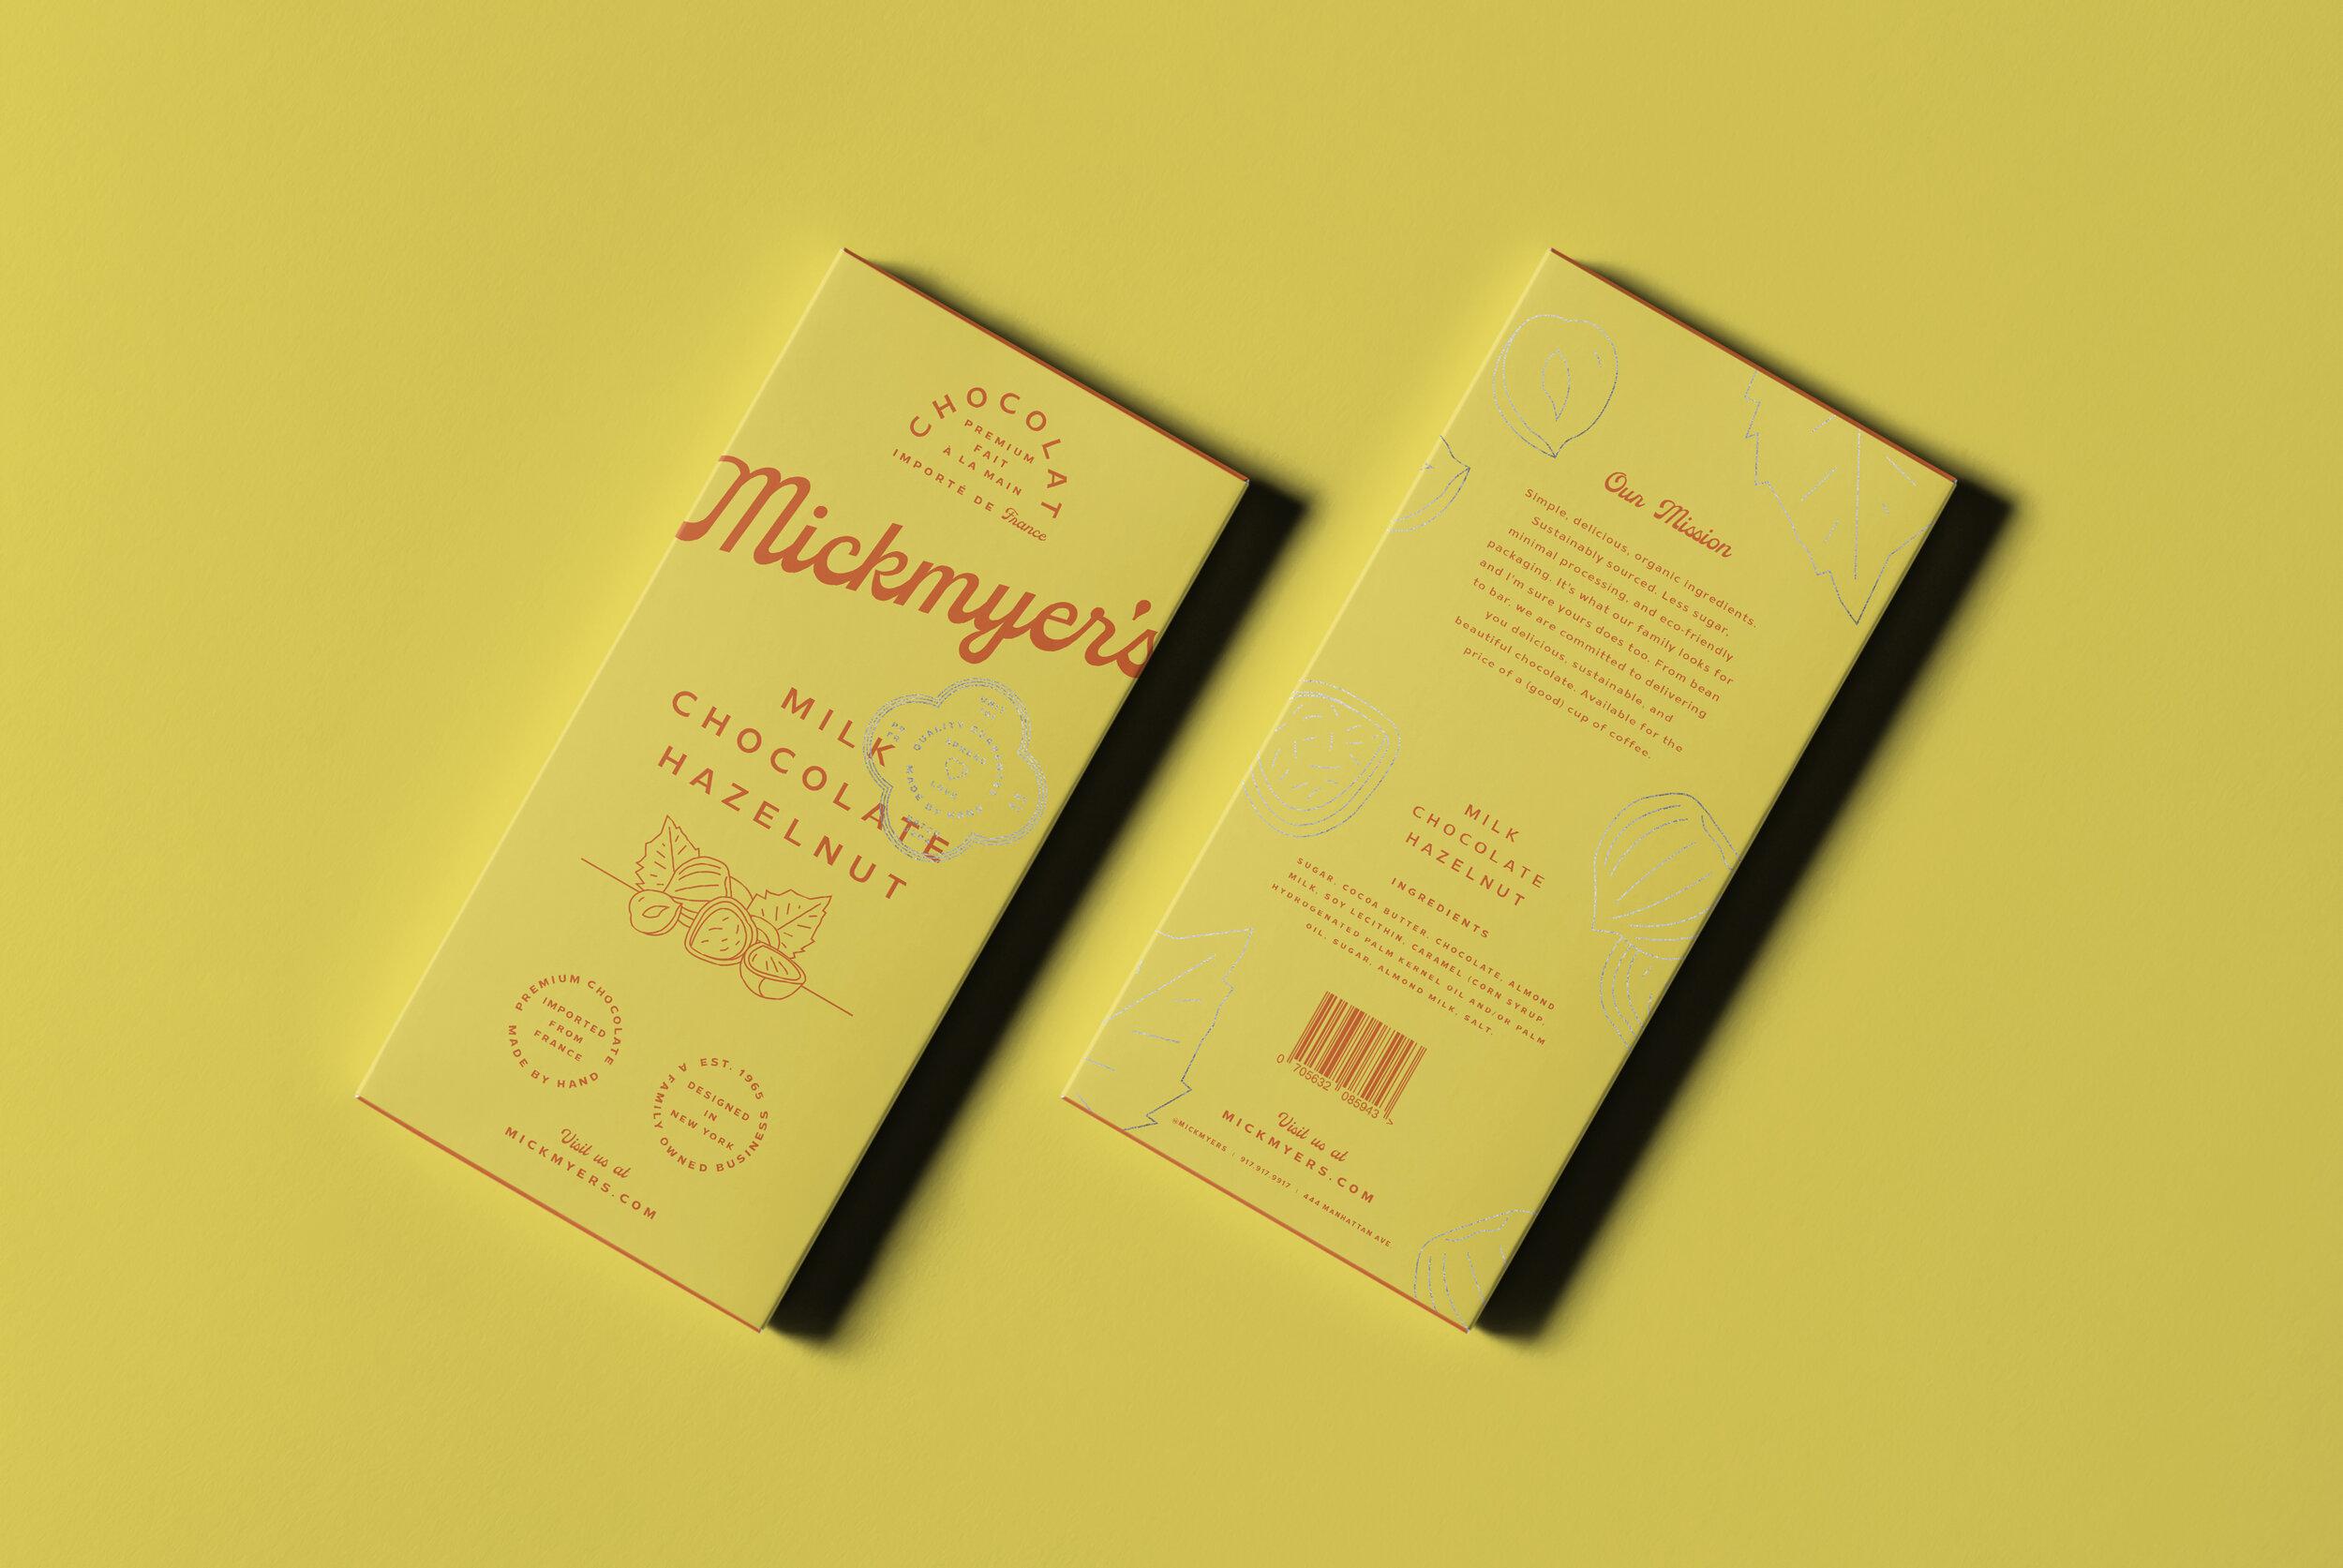 Mickmyers-Packaging-Front-Back.jpg